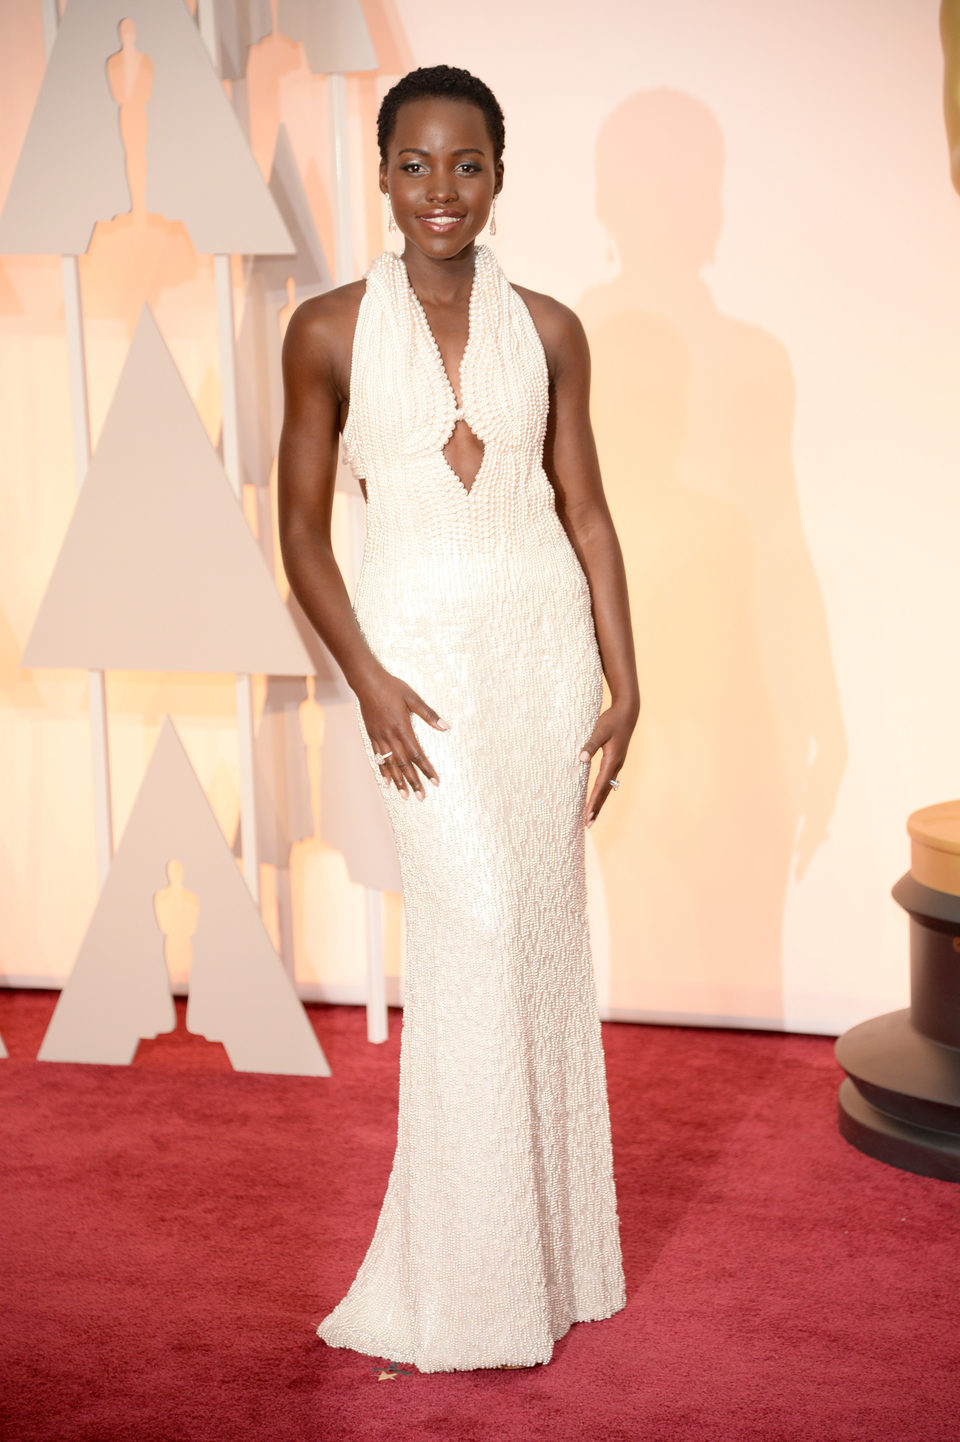 Lupita Nyong'o en la alfombra roja de los Oscar 2015